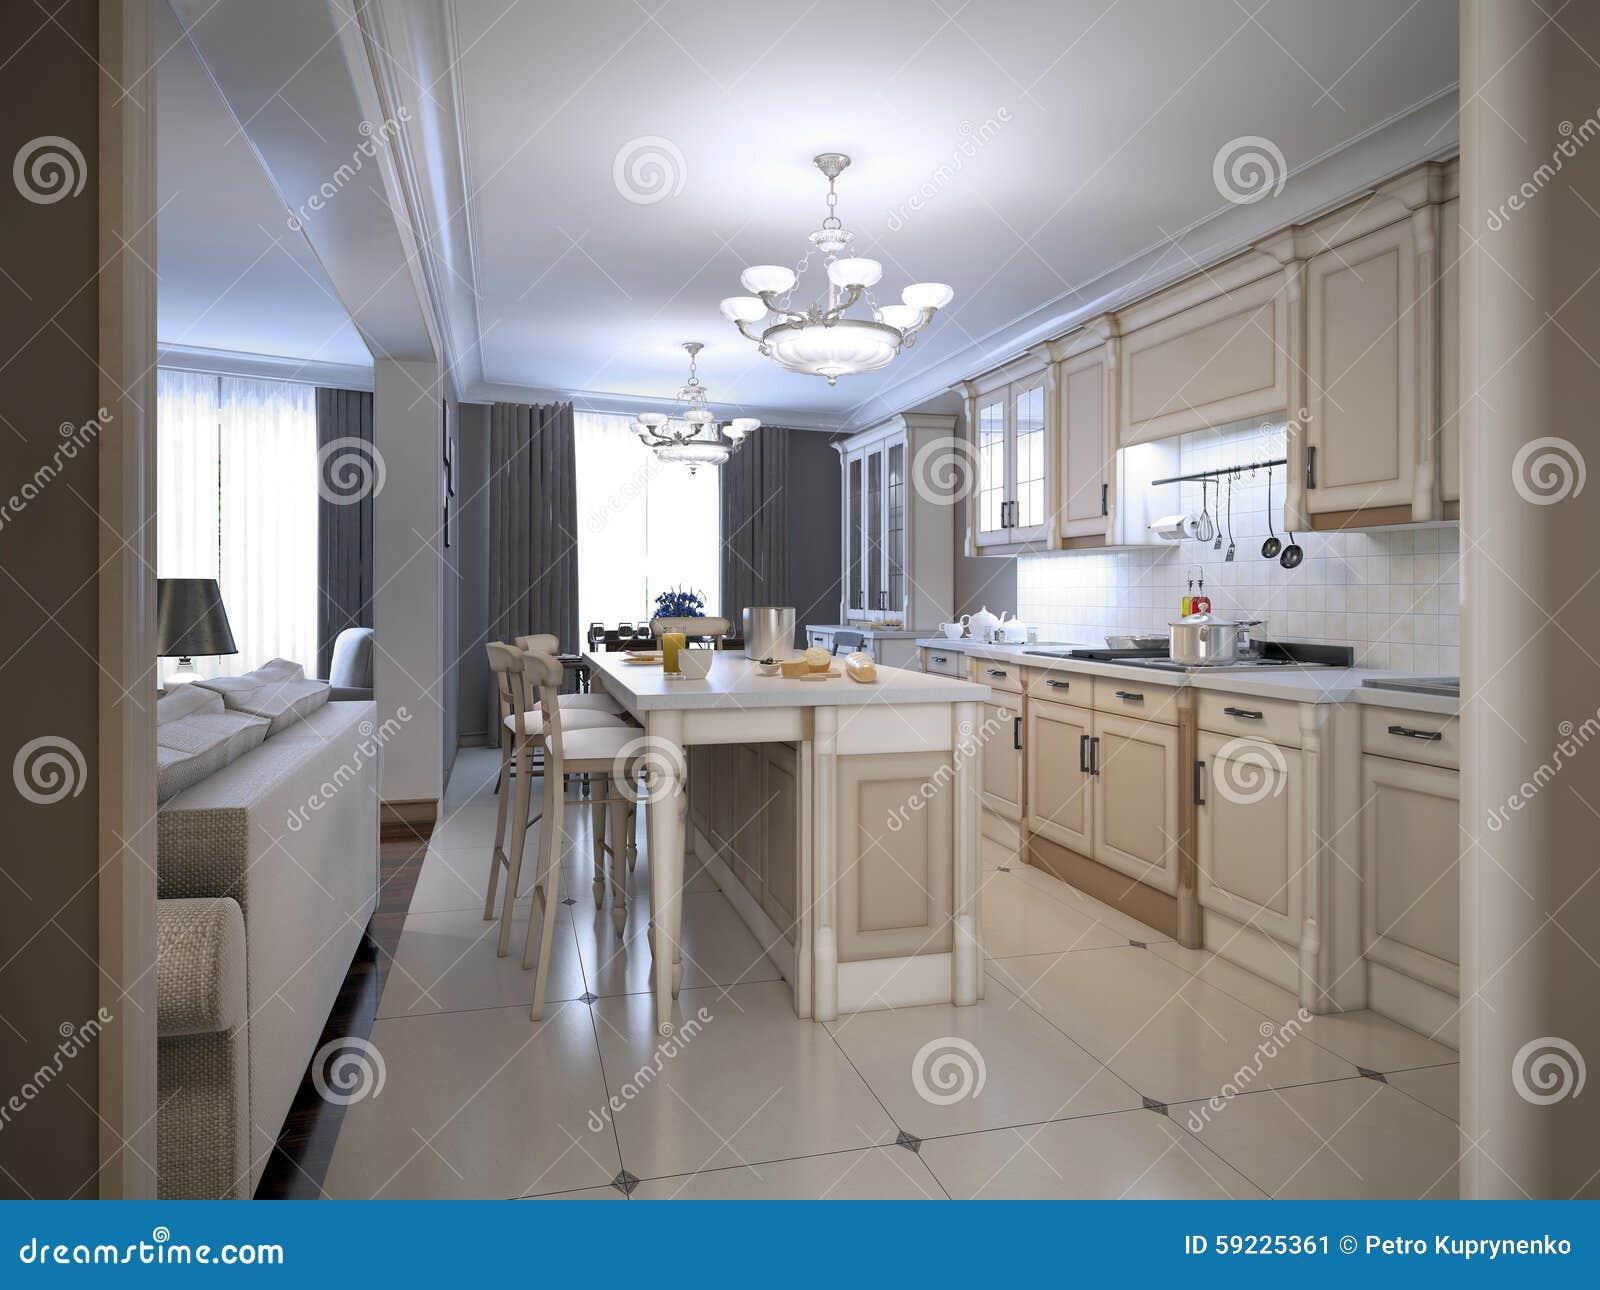 Kitchen provence style stock image. Image of appliances - 59225361